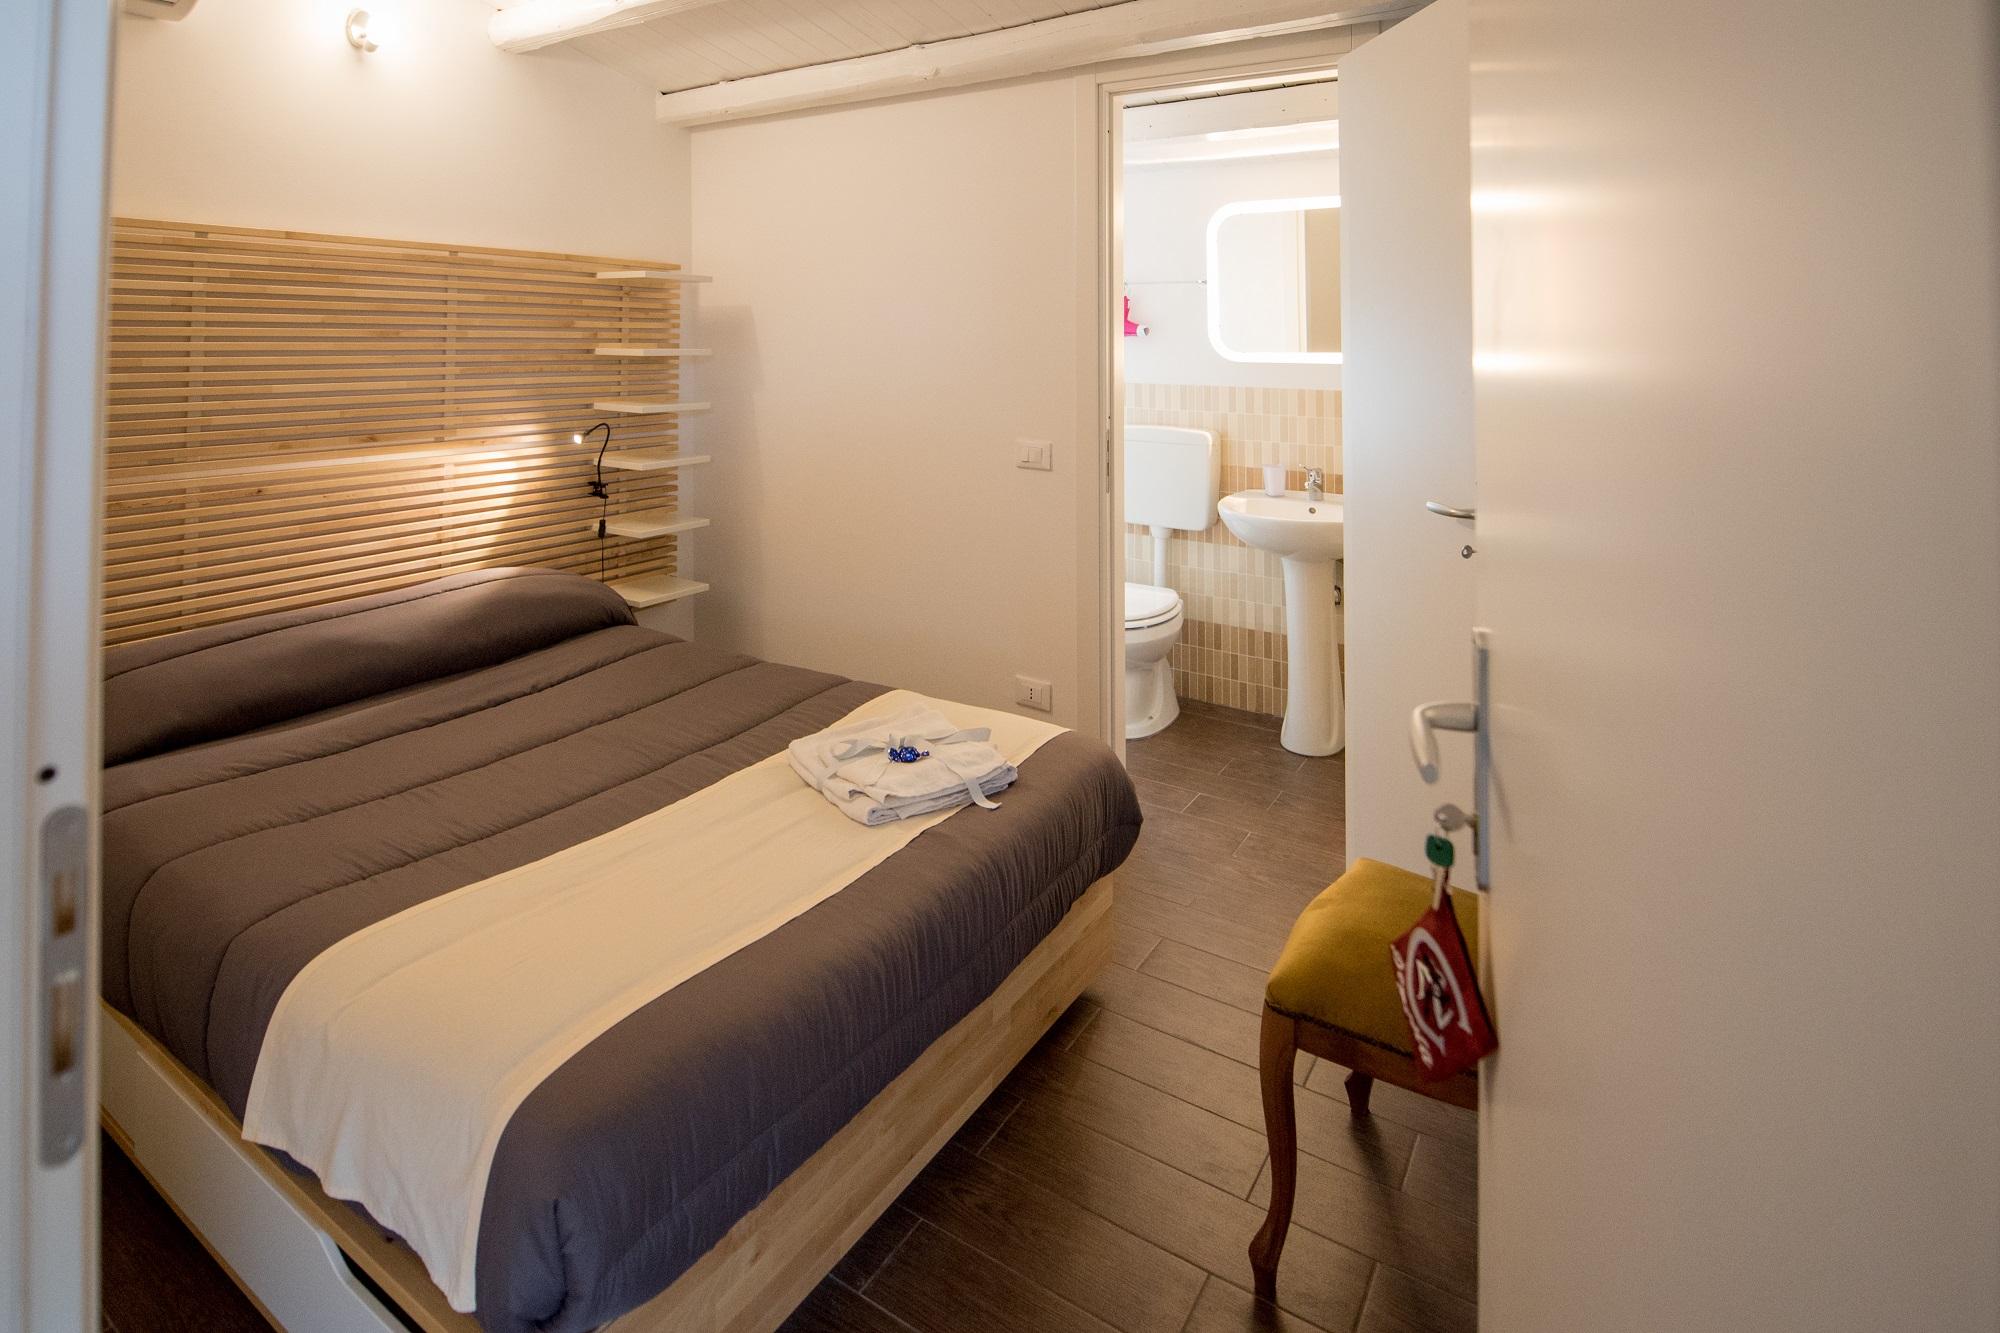 Holiday apartment Camagna Country House - in der sizilianischen Landschaft eingetaucht (2420806), Partanna, Trapani, Sicily, Italy, picture 2